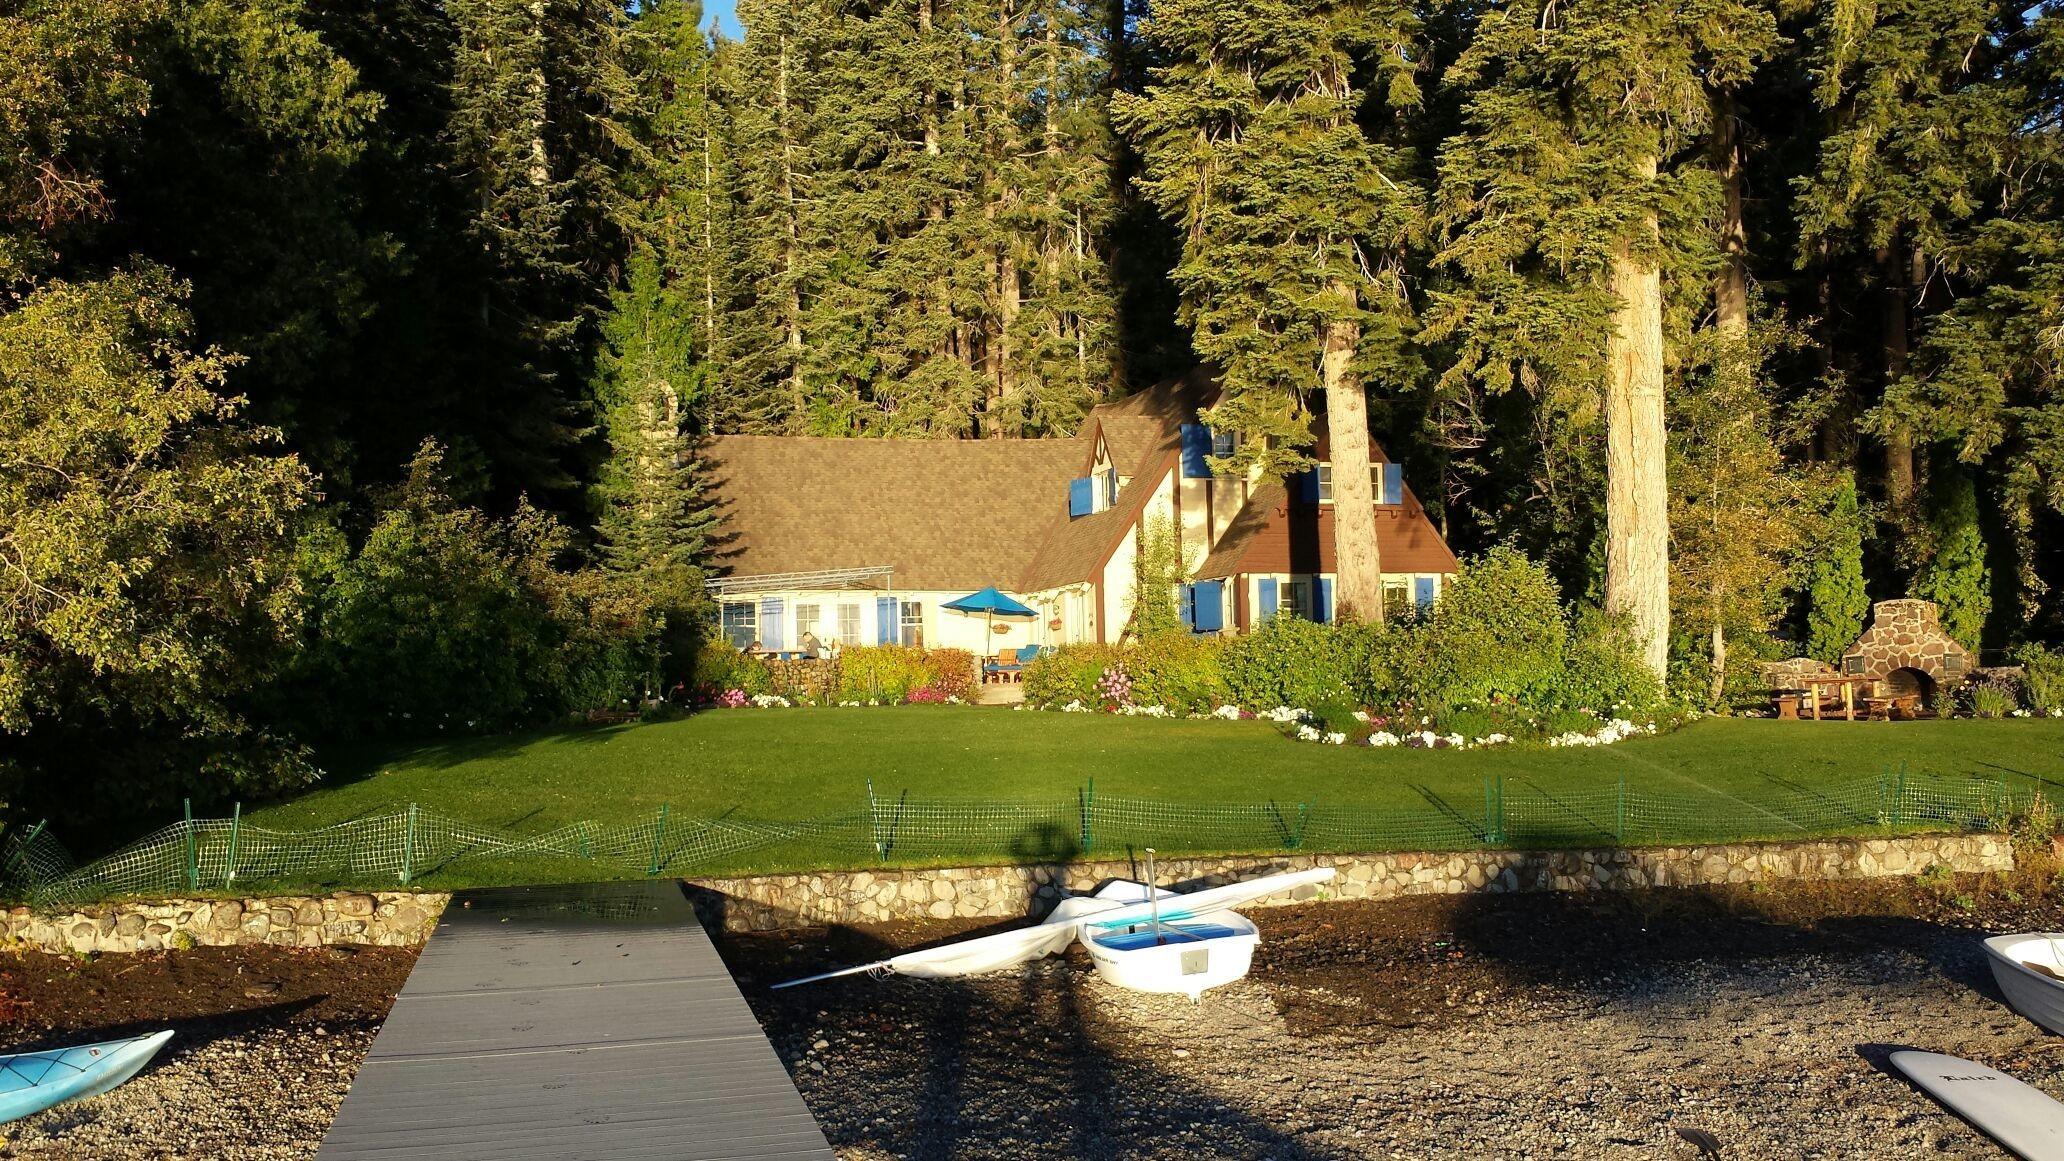 Dan Camp. Sunrise on Lake Tahoe